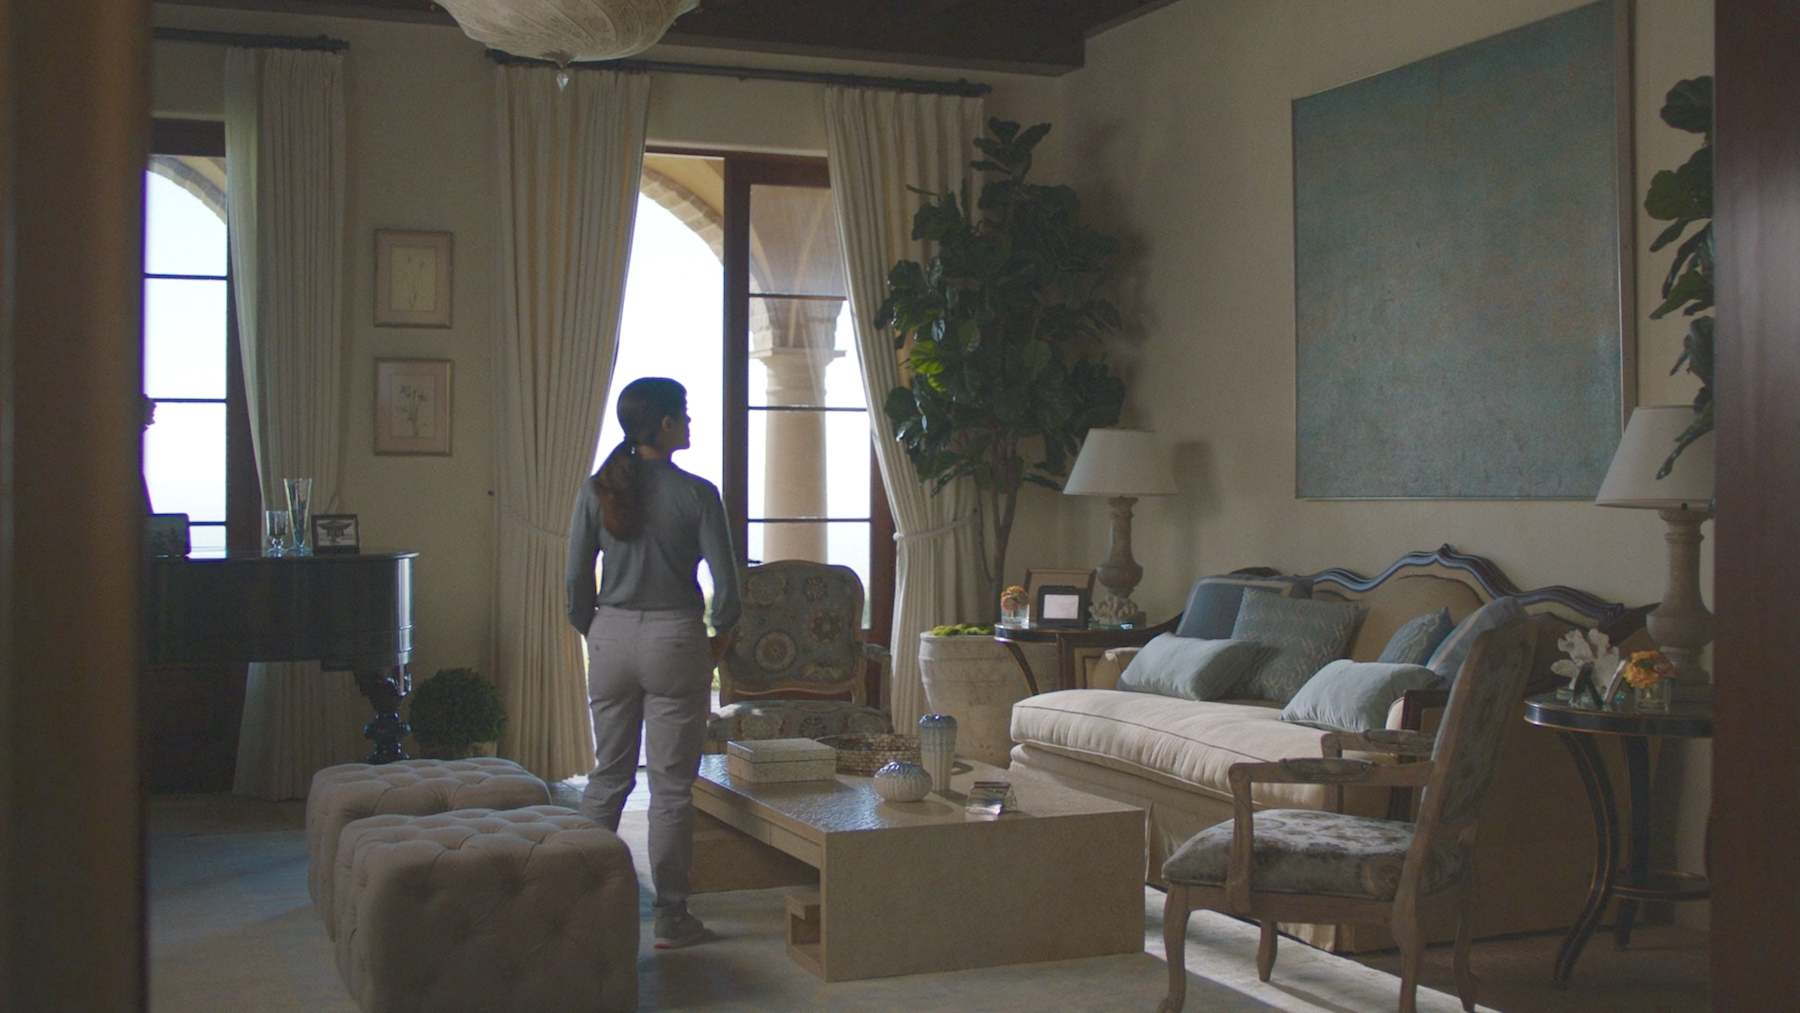 The Furniture Beatriz At Dinner In A Tacky Muted Mansion Blog  # Meuble De Tv En Biatrez